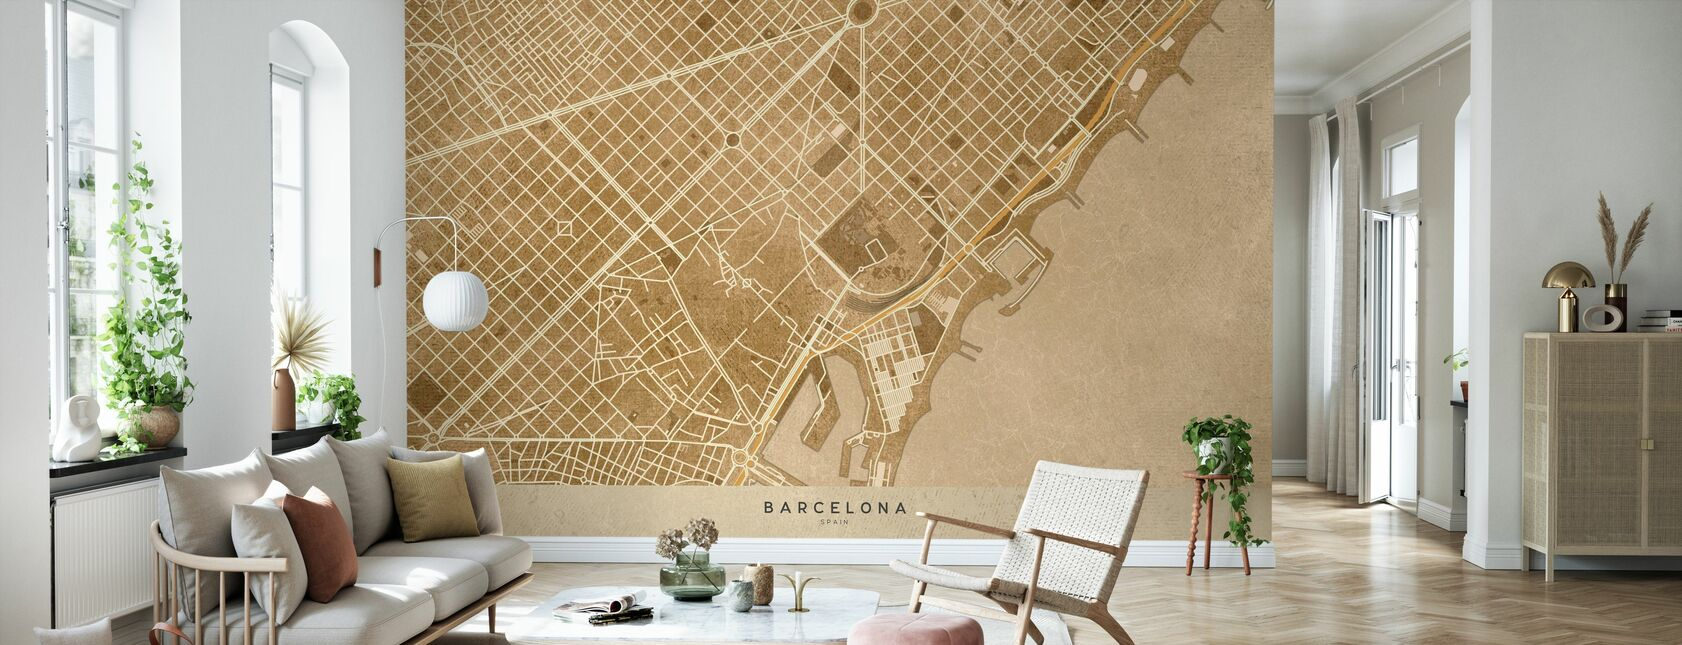 Barcelona Map - Wallpaper - Living Room